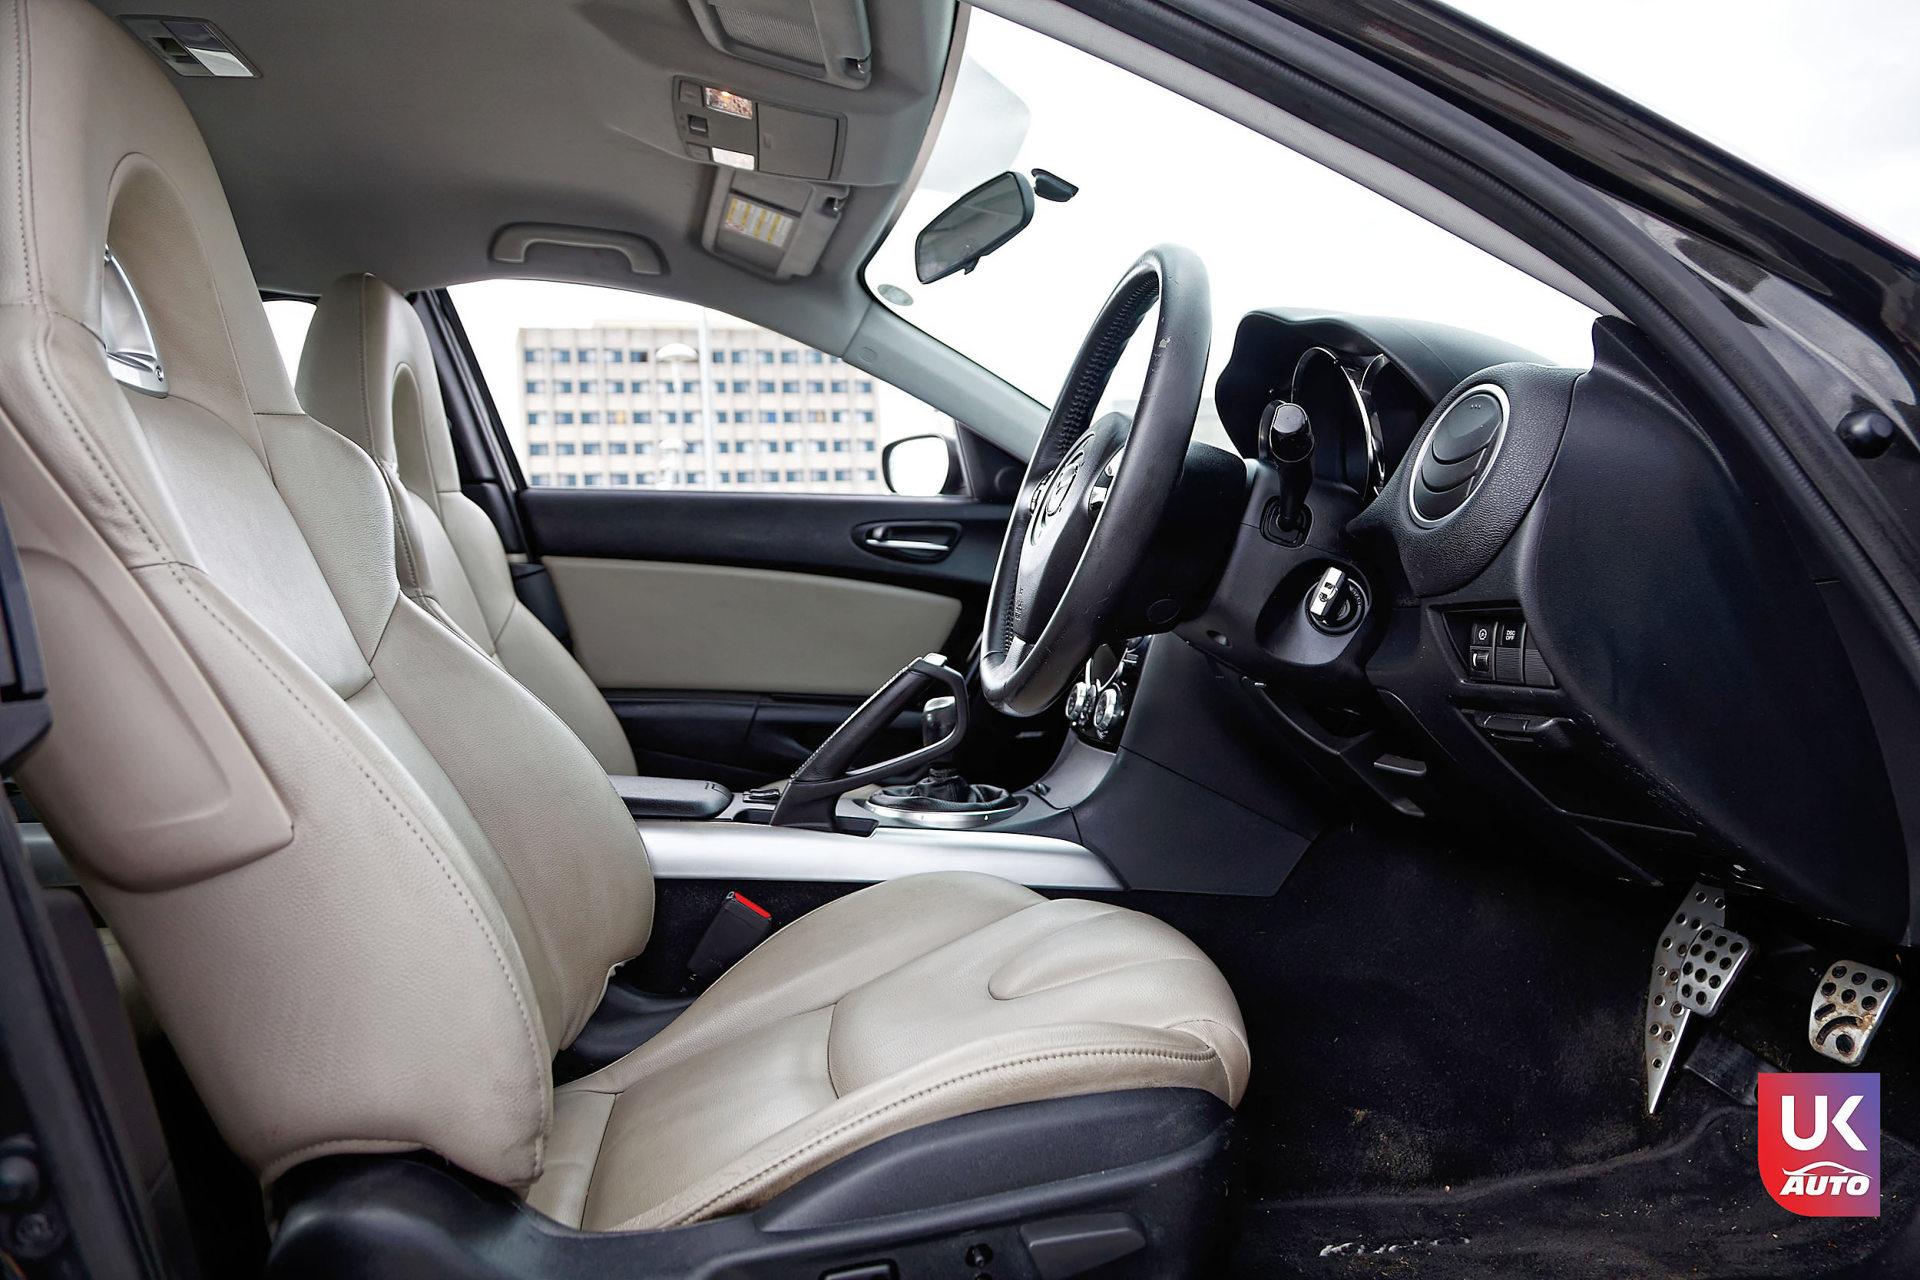 Mazda RX8 Rotary mazda angleterre mazda uk RX8 KURO import uk rhd7 DxO - Import Mazda RX8 KURO ROTARY depuis Autotrader par UKAUTO site annonces UK rhd Felicitation a Dimitri